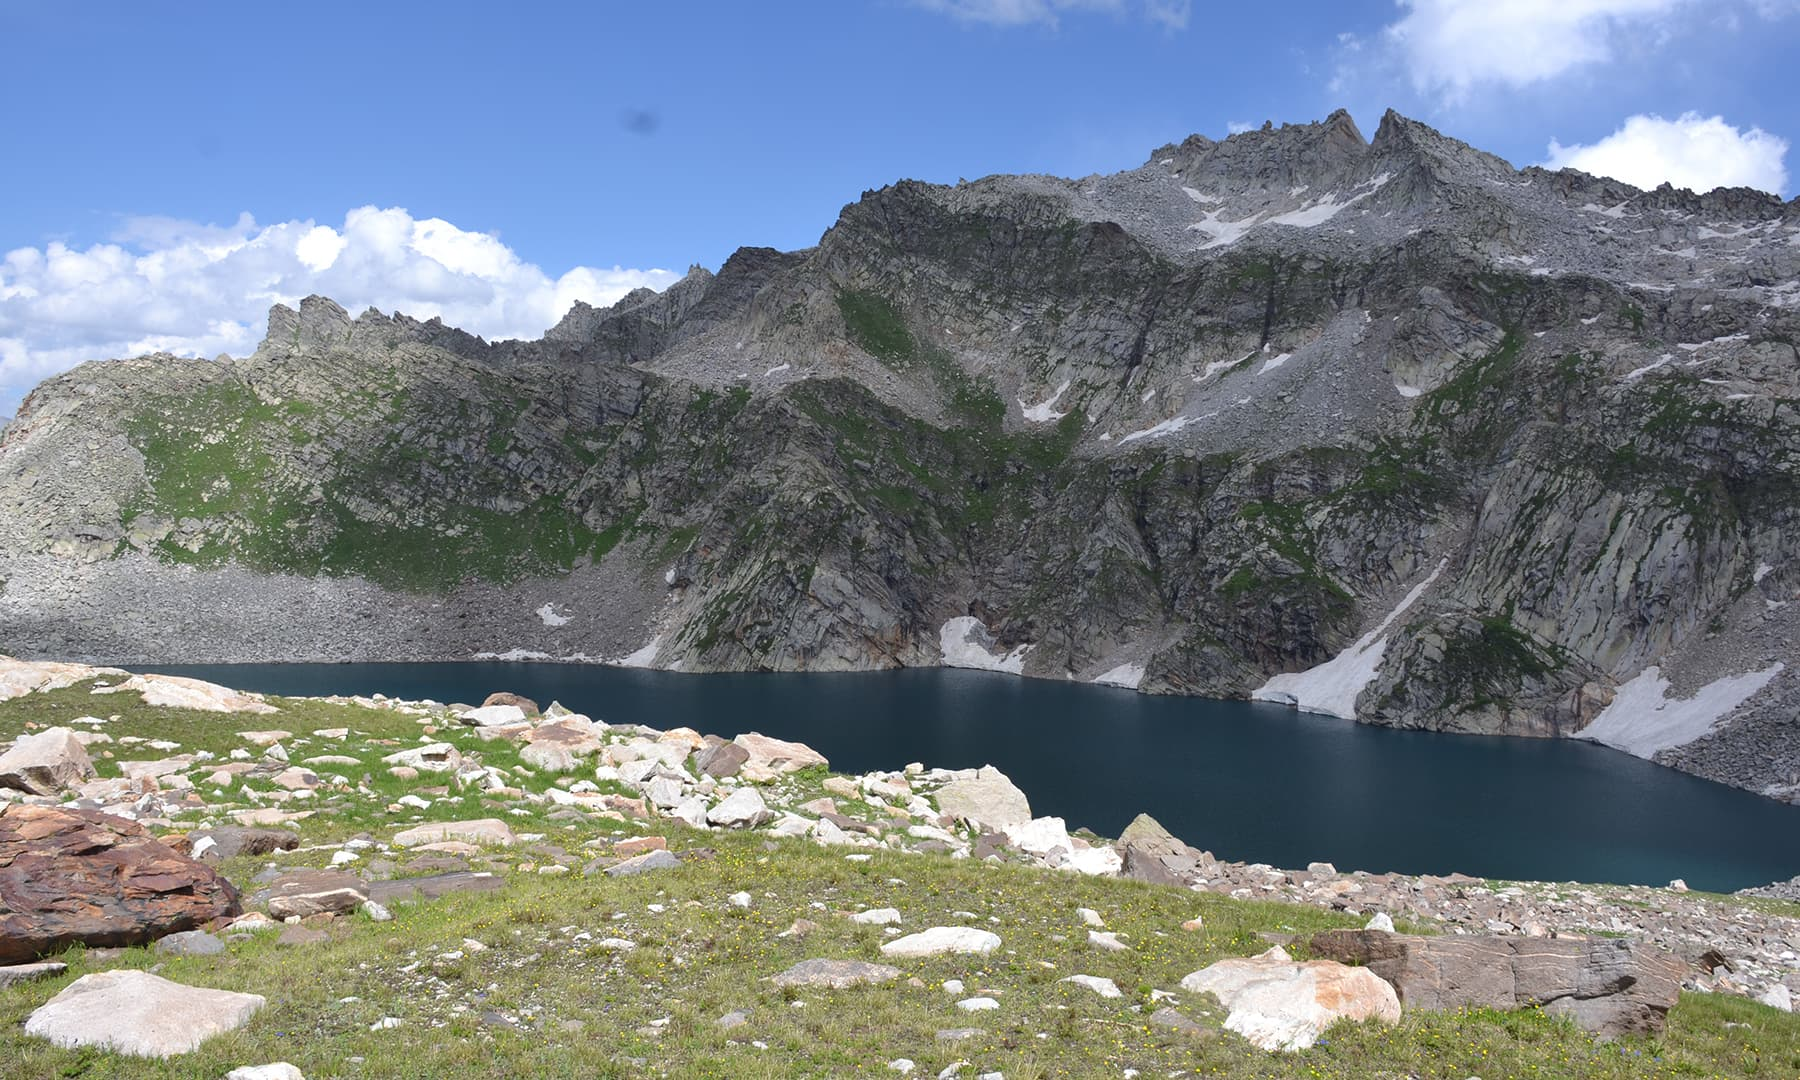 شکر گڑھ جھیل—تصویر  سلمان خان